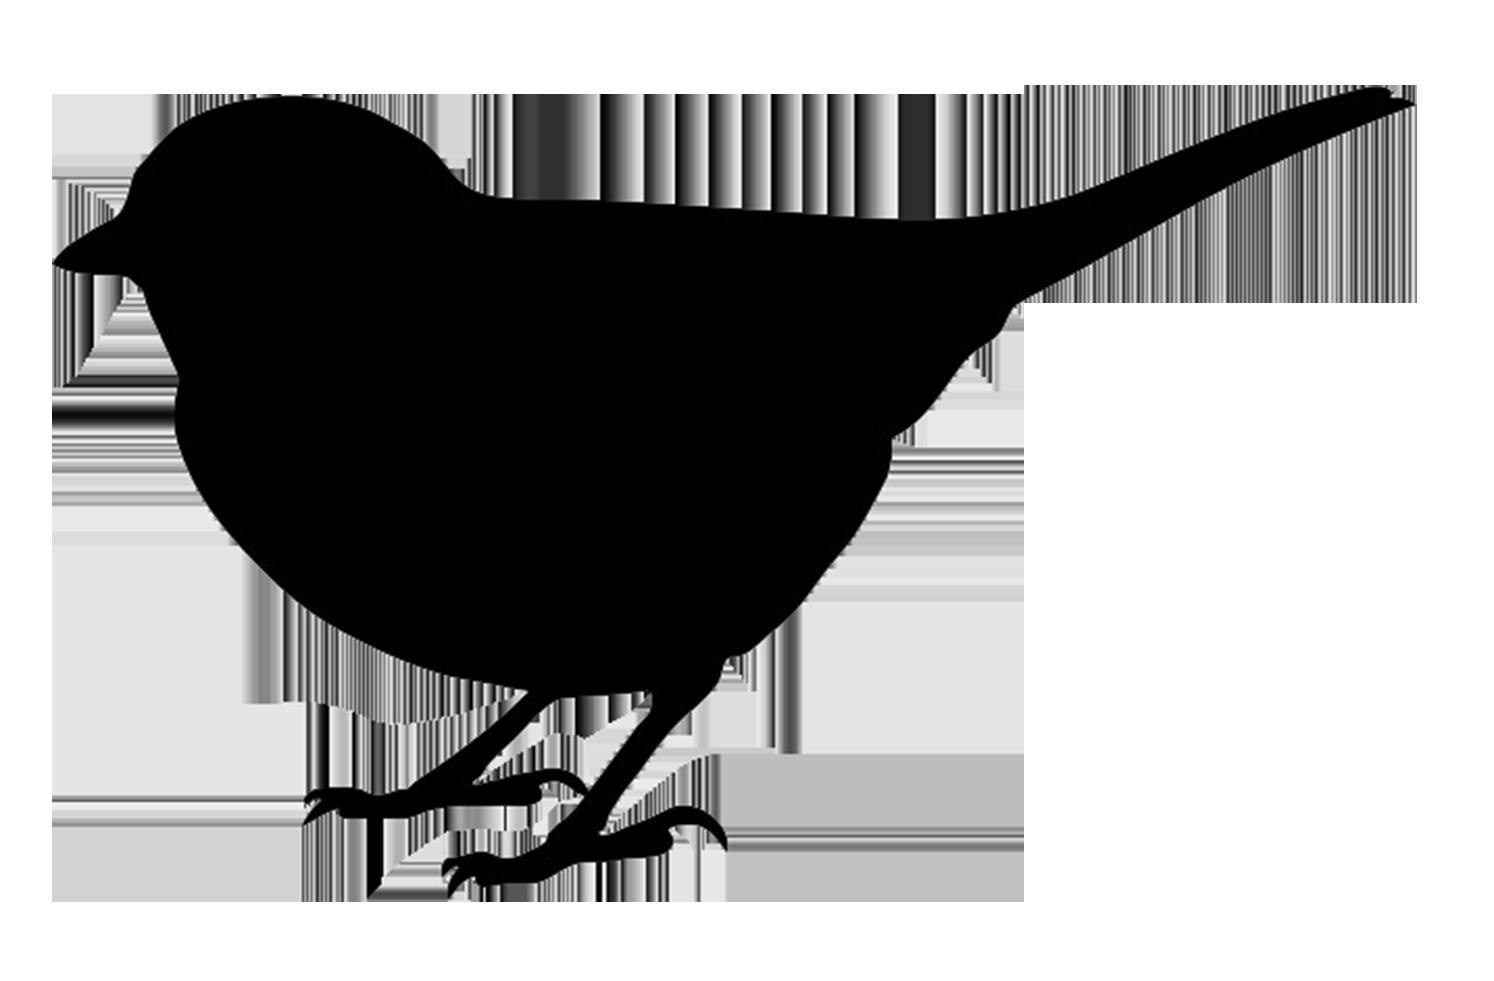 Bird Silhouettes Bird silhouette, Bird drawings